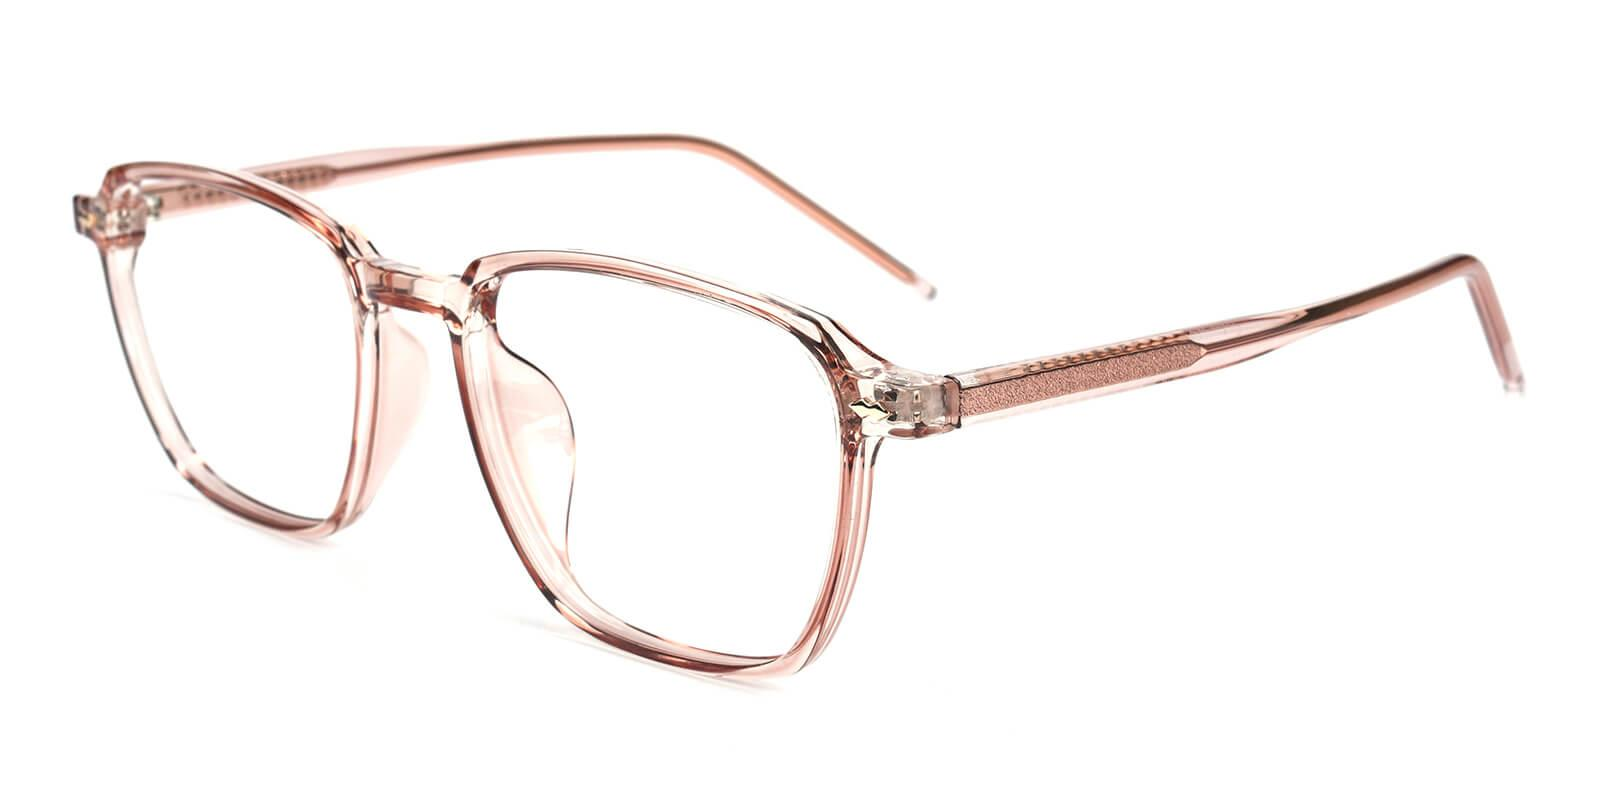 Rolita-Pink-Square-Acetate / TR-Eyeglasses-additional1